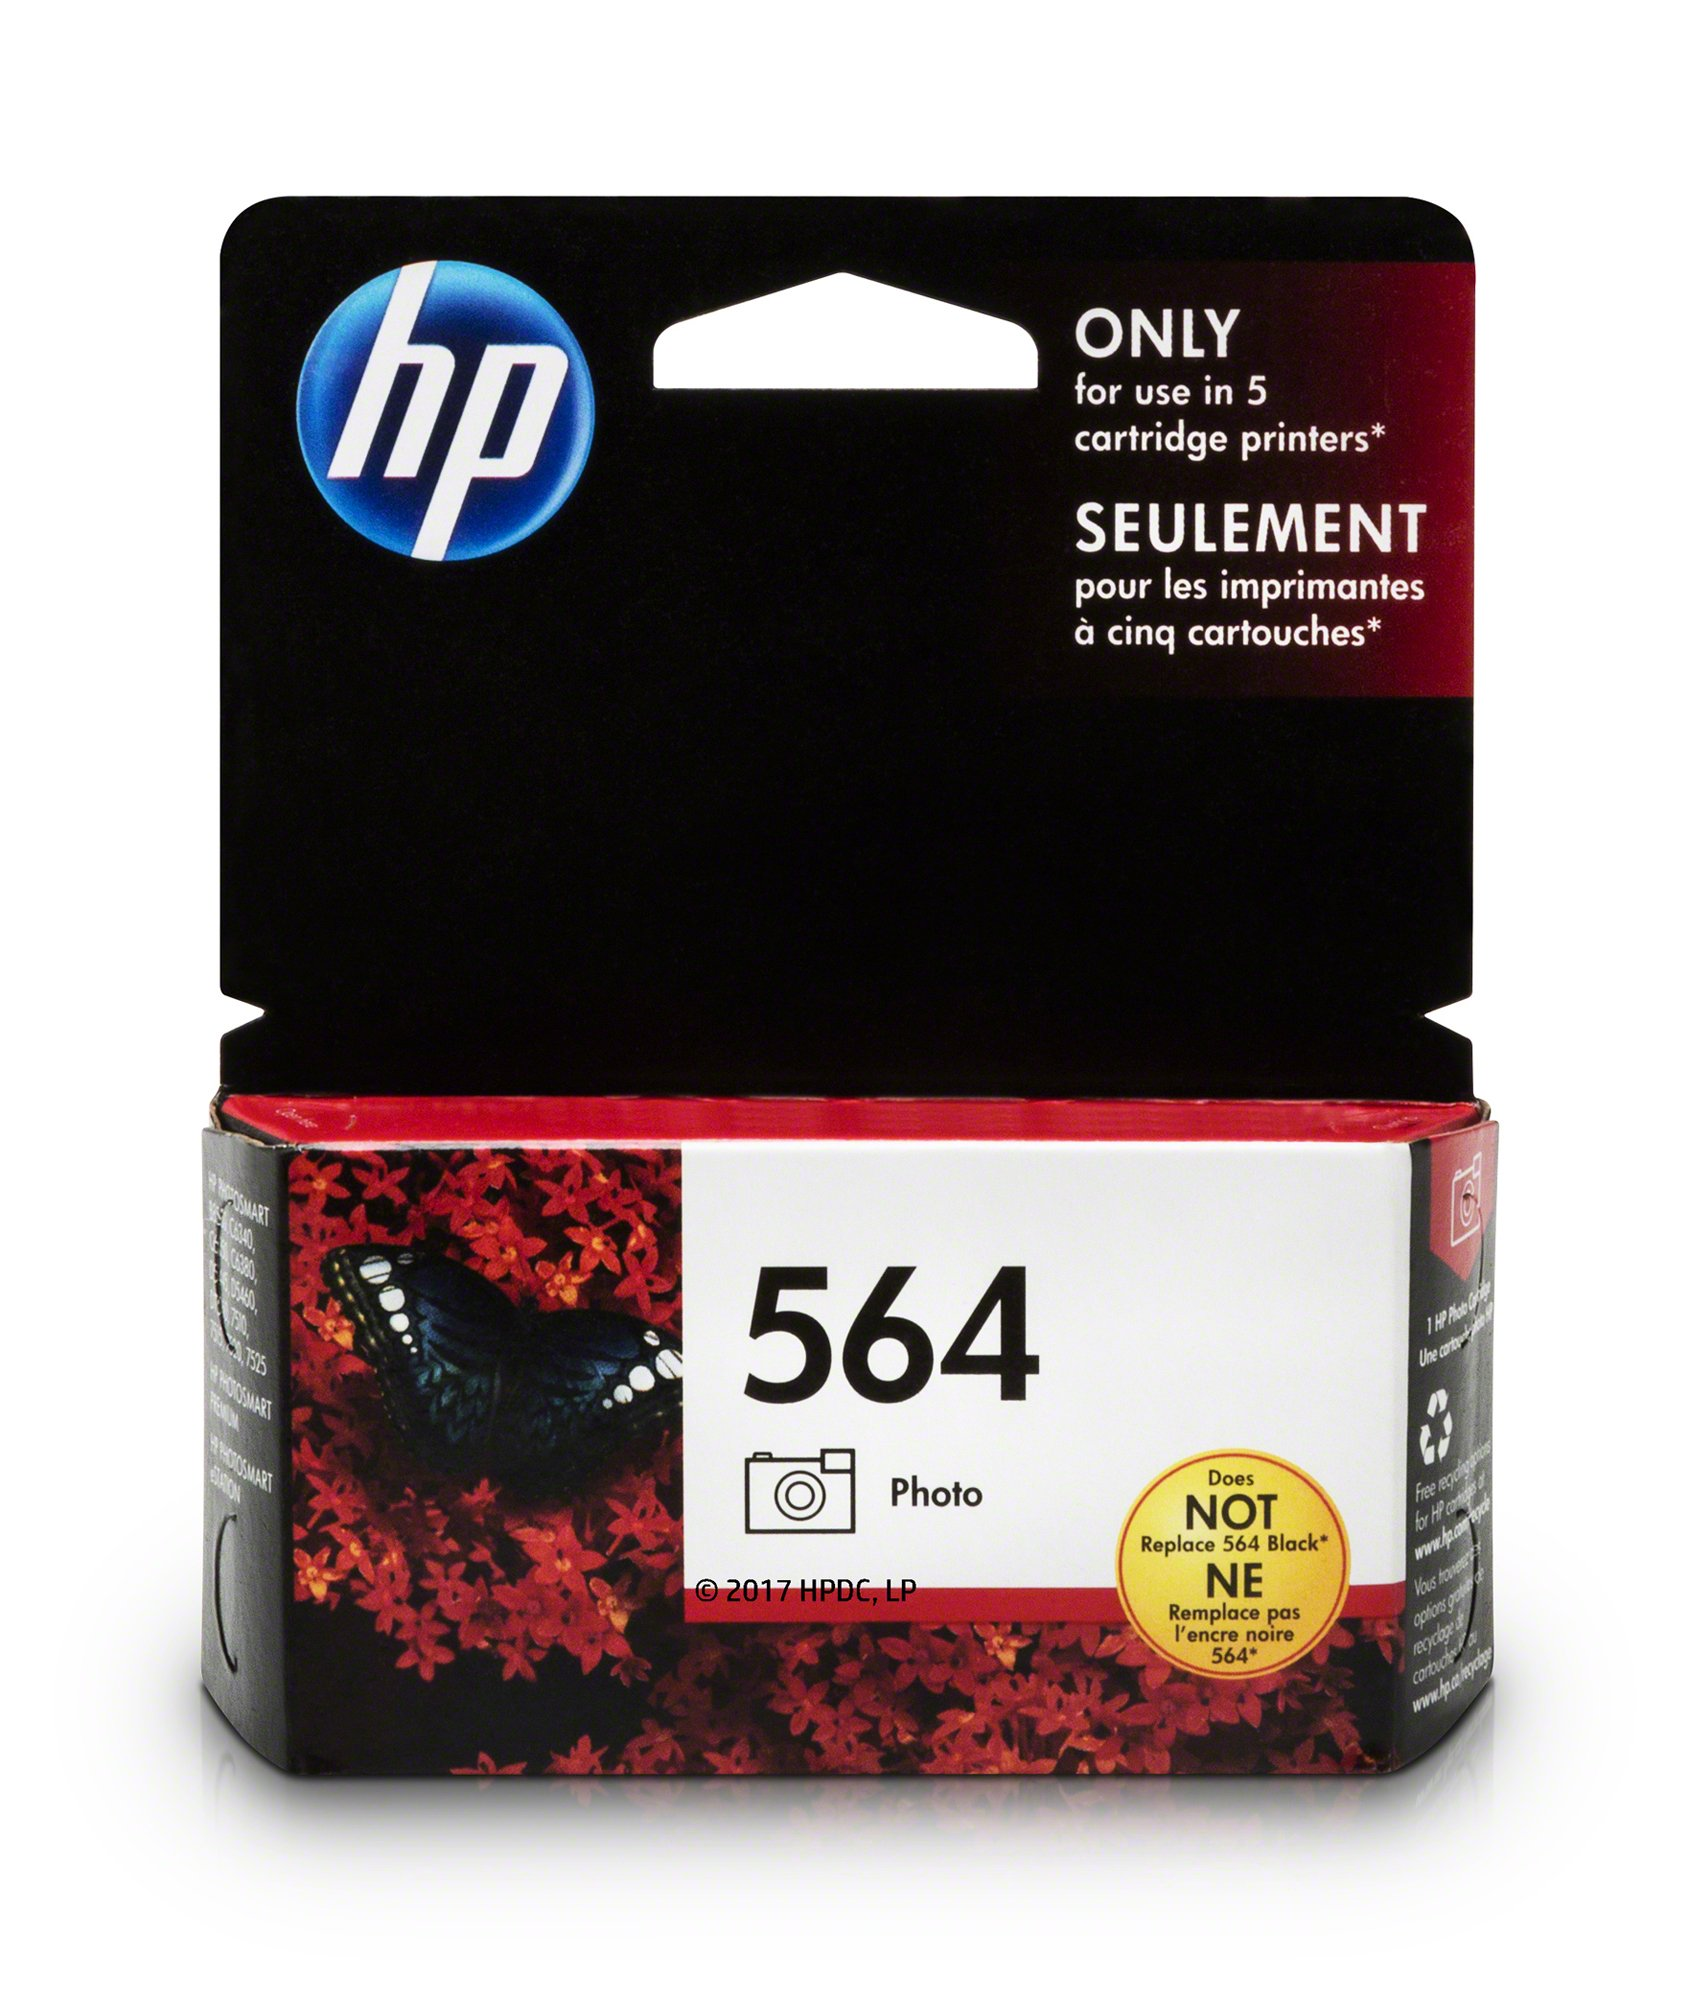 HP 564 Photo Ink Cartridge (CB317WN) for HP Photosmart B8550 D5445 D5460 D7560 7510 7515 7520 7525 C6340 C6350 C6380 C510a C309g C310a HP Photosmart Premium Fax e-All-in-One Printer C410a HP Photosmart Premium TouchSmart Web All-in-One Printer C309n